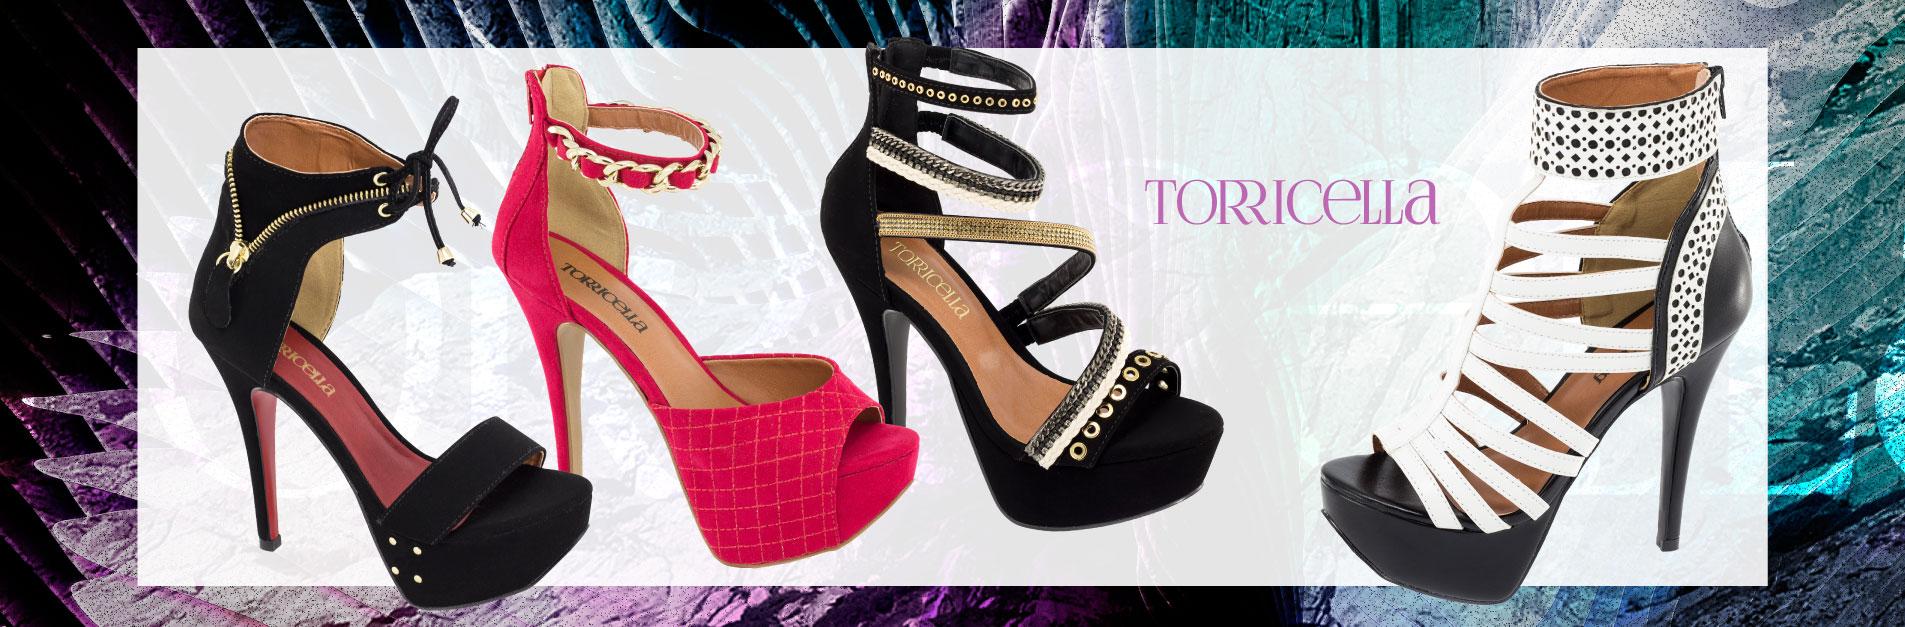 Torricella Sapatos